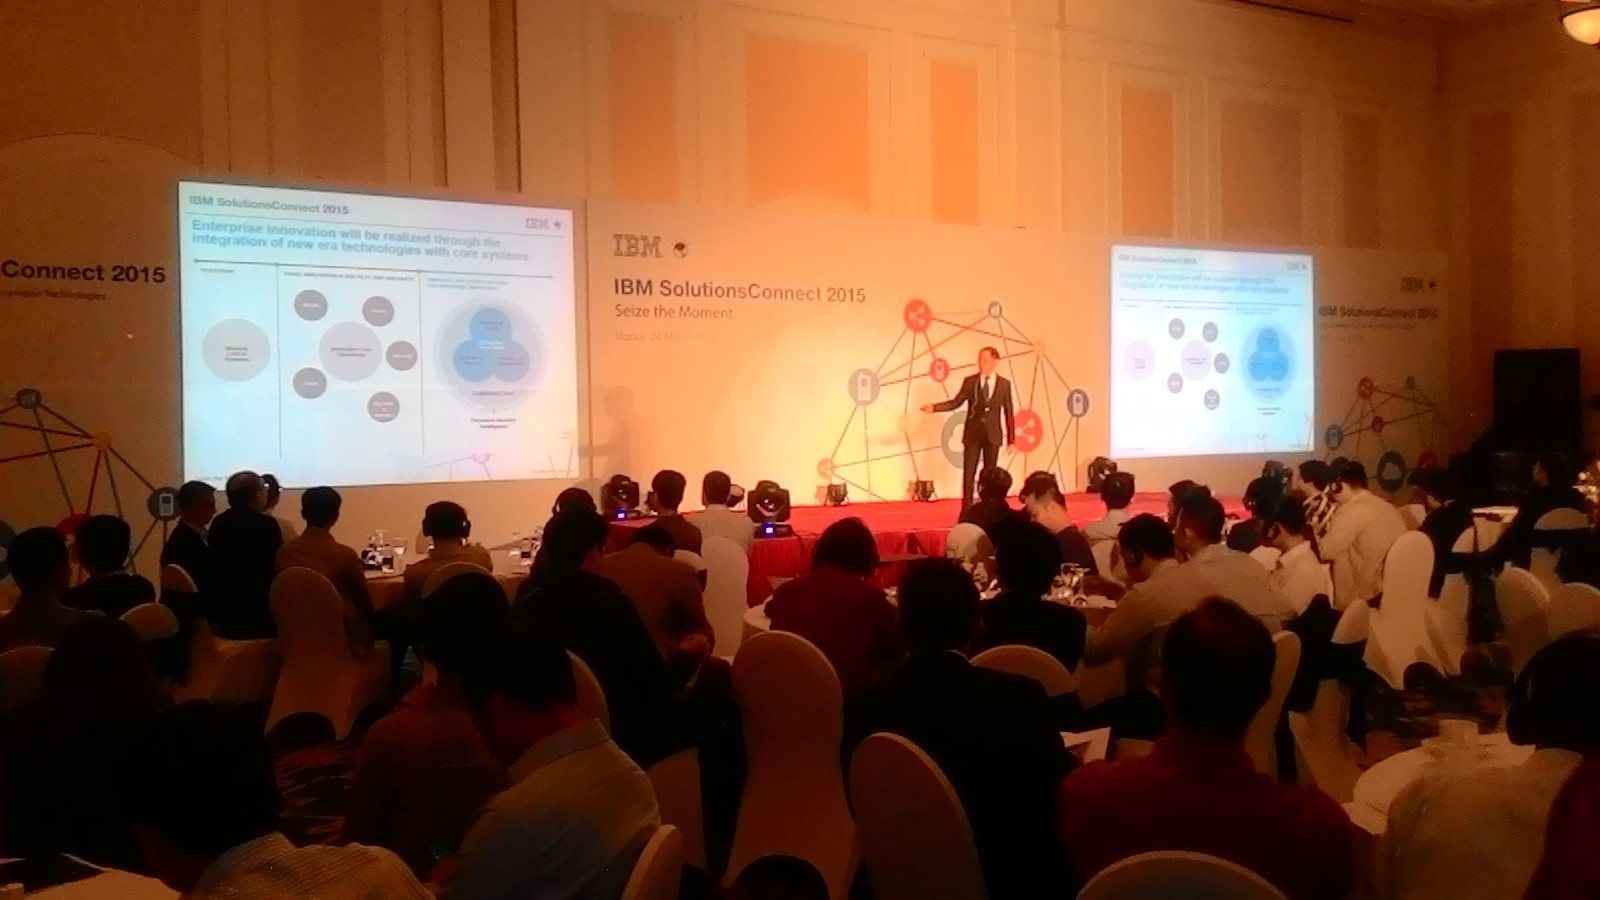 Tổ chức sự kiện IBM Connect Solution 2015